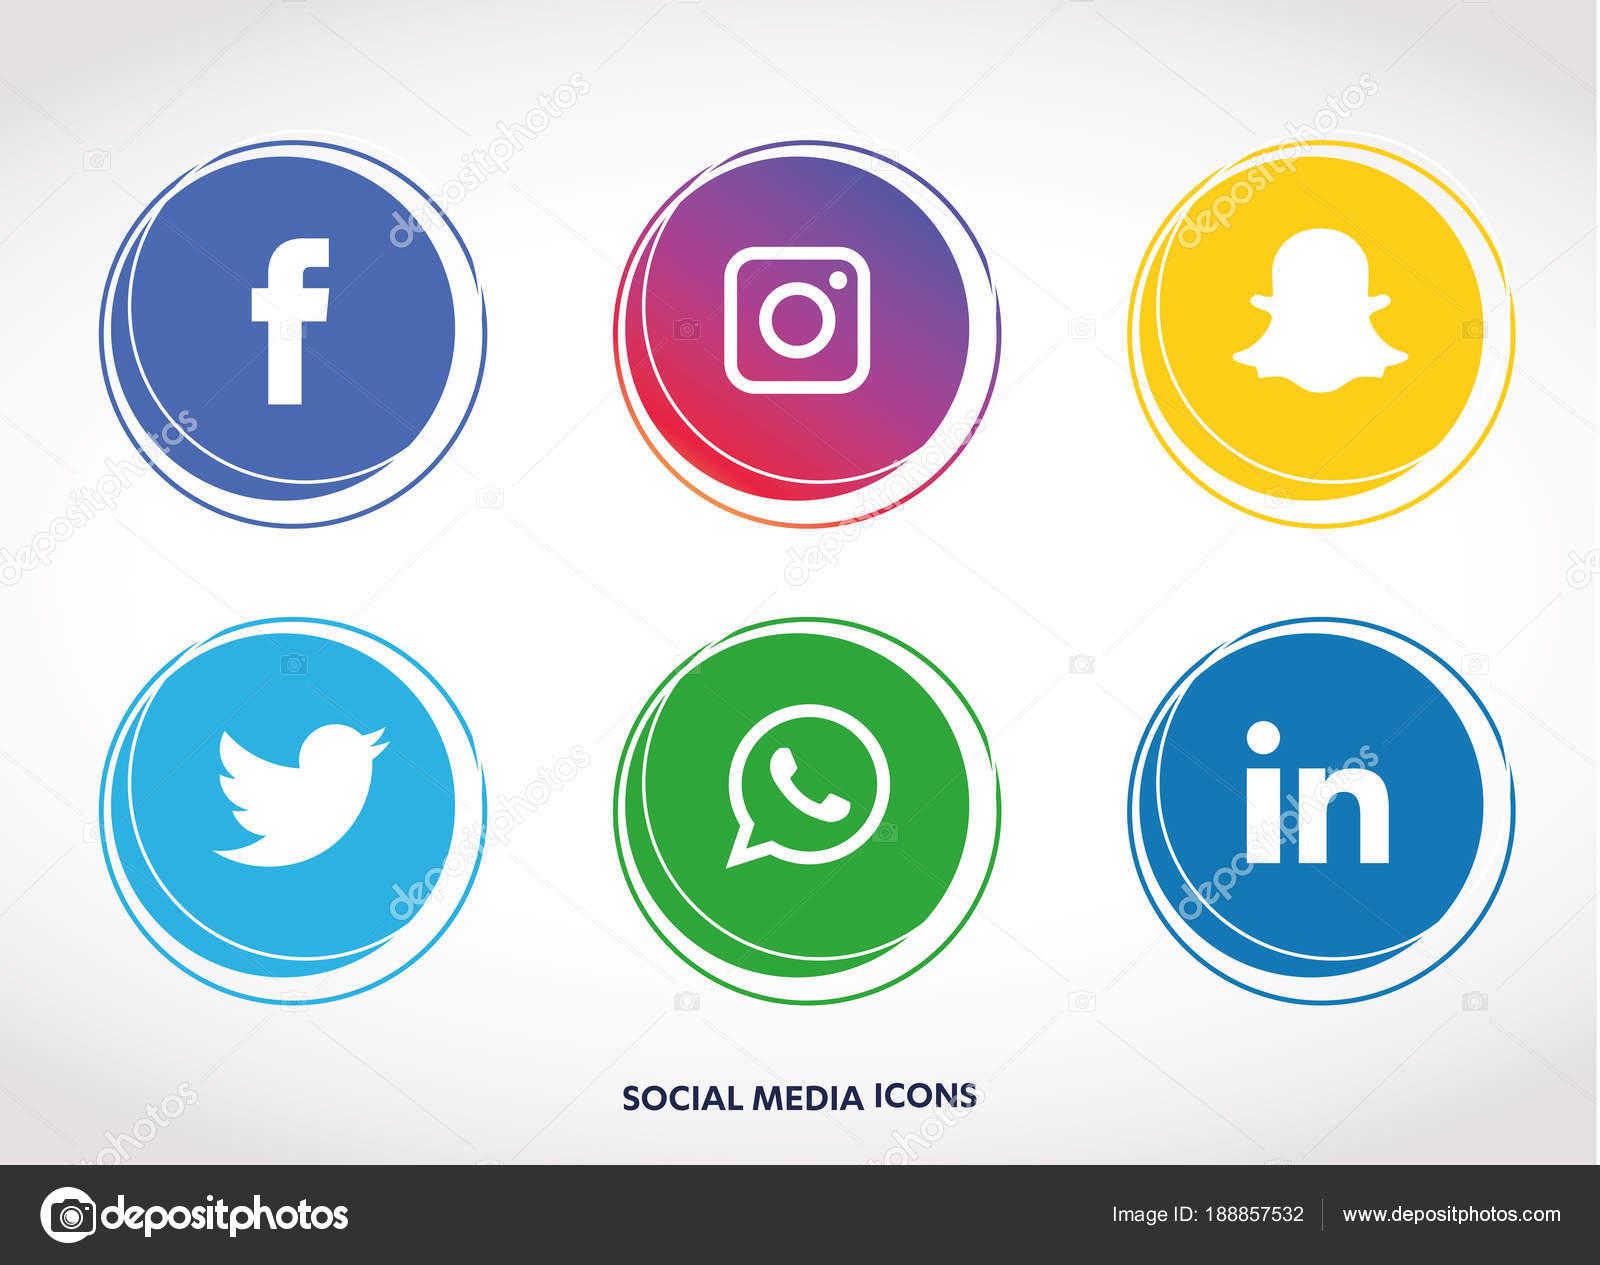 3 Social Media Platforms To Understand